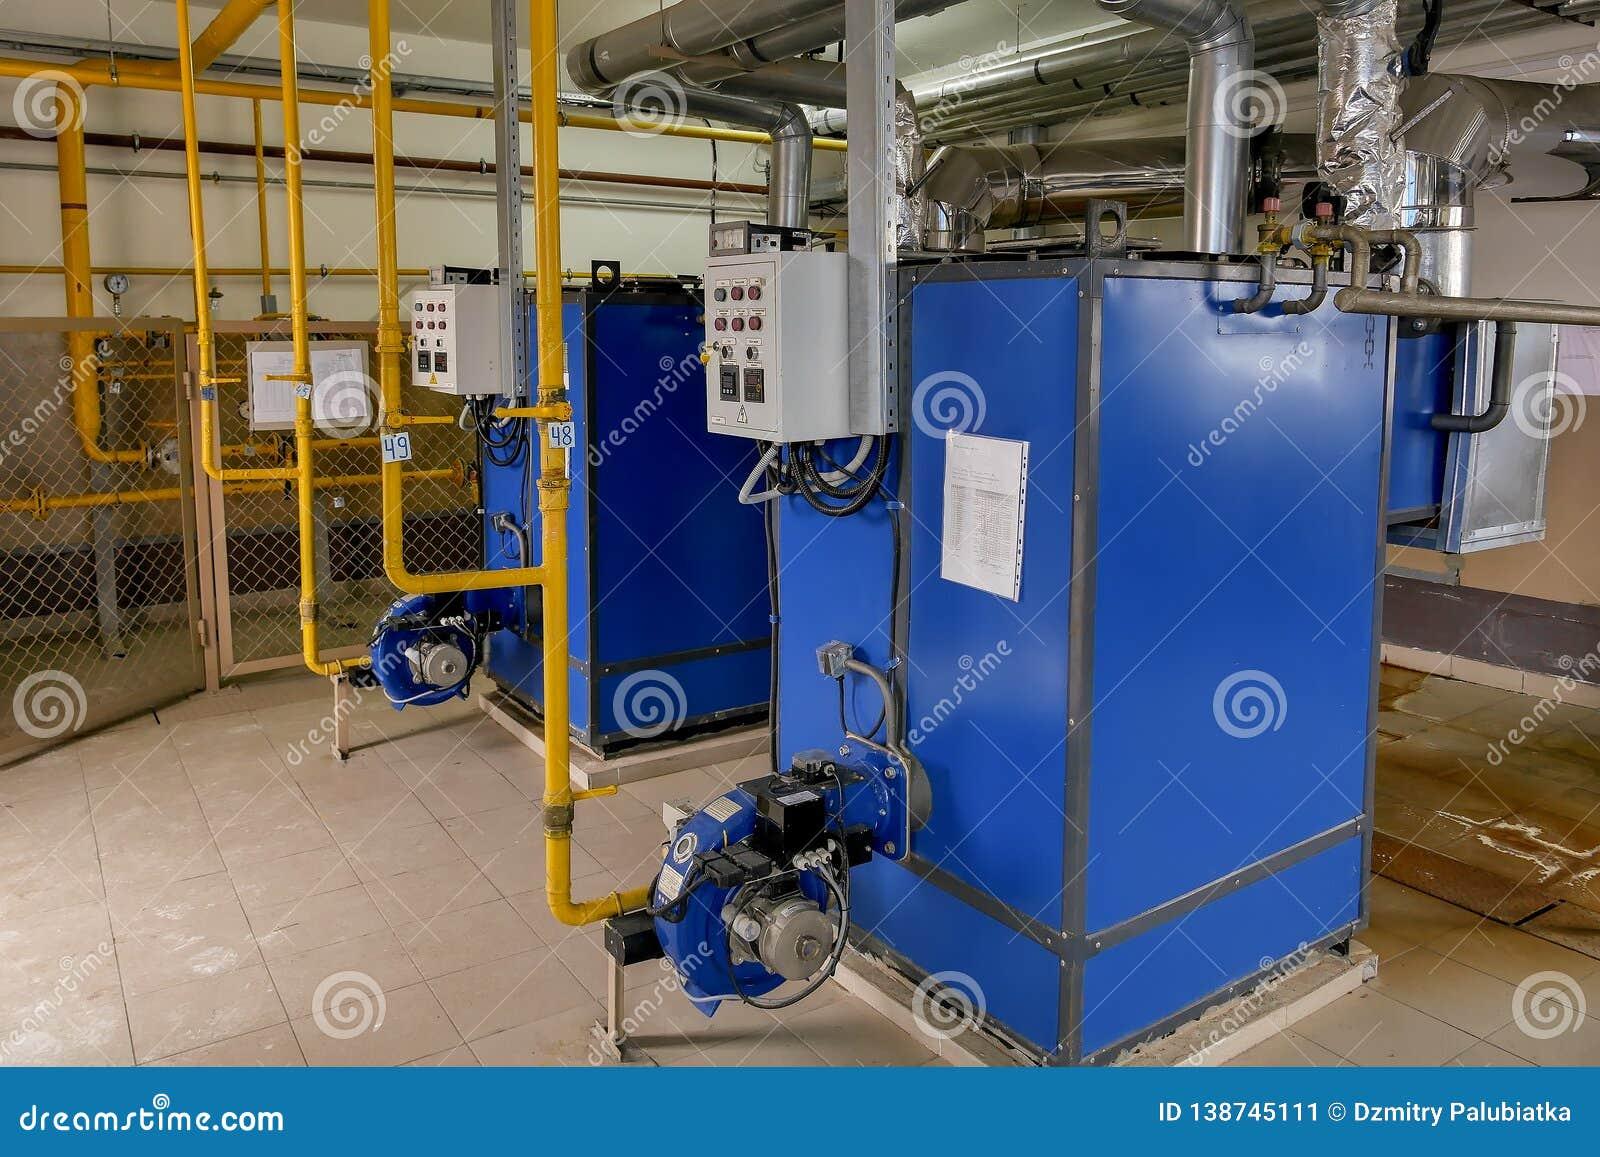 Boiler room of the enterprise. Gas boilers for heating